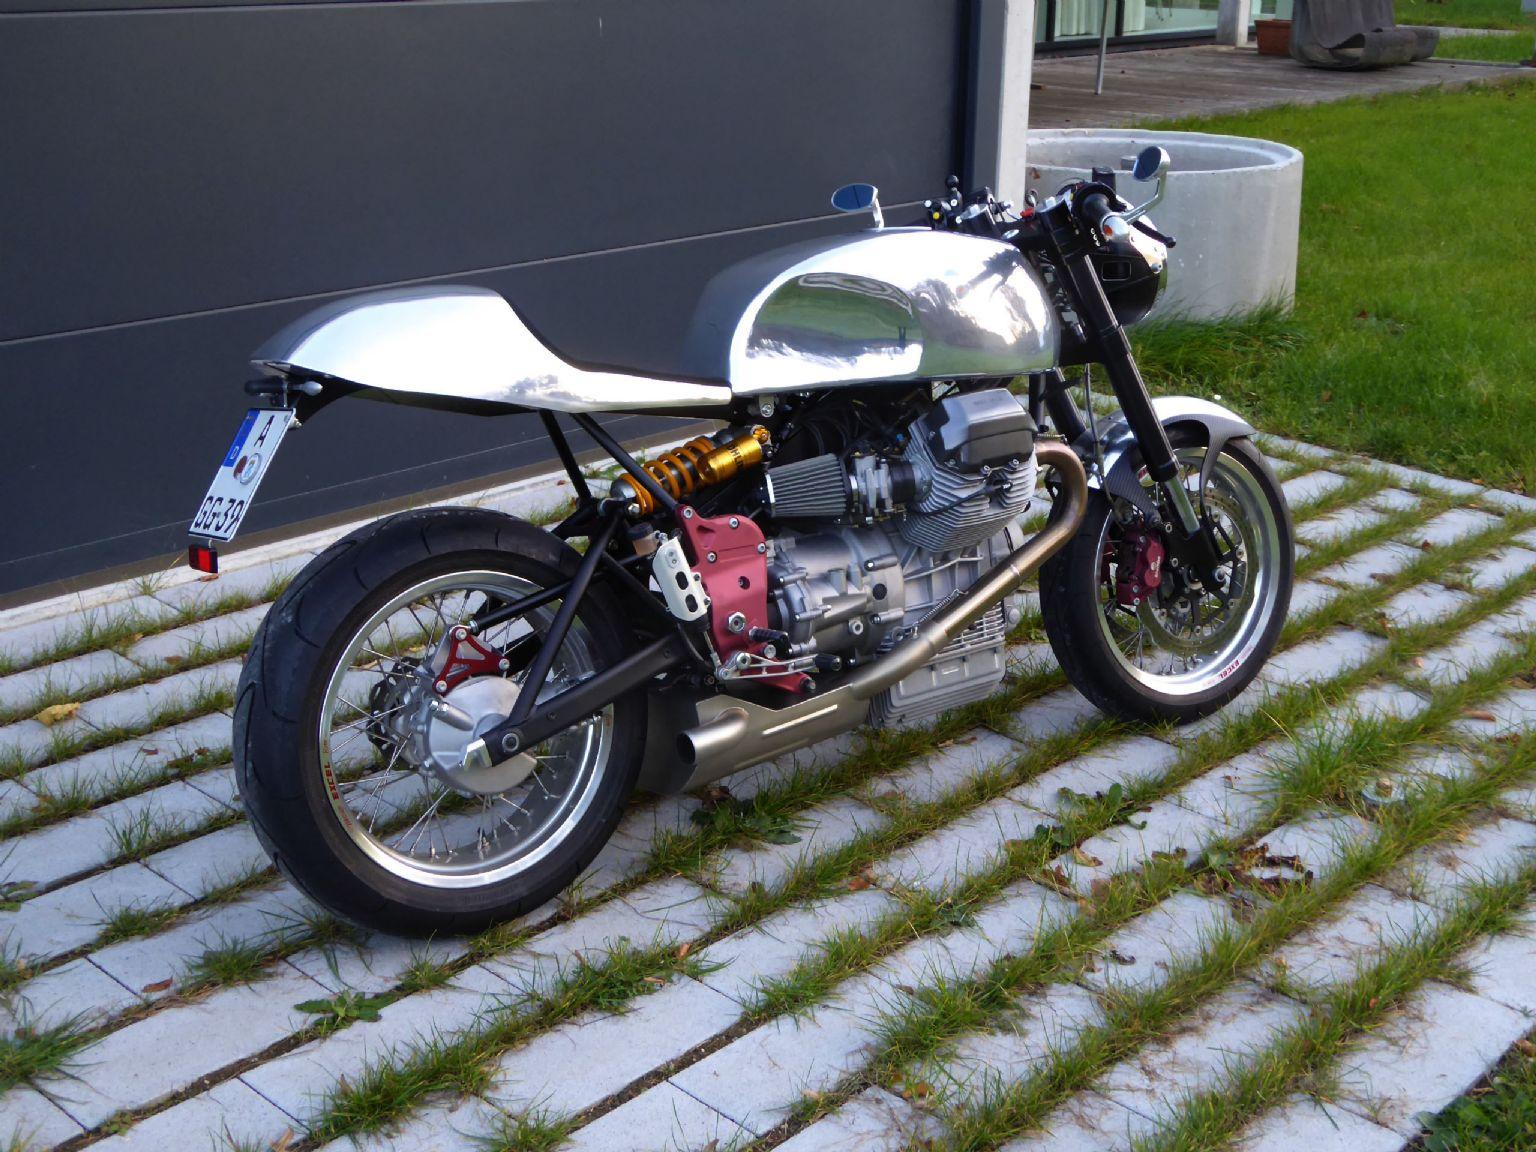 umgebautes motorrad moto guzzi v11 sport naked von der inschinoer. Black Bedroom Furniture Sets. Home Design Ideas